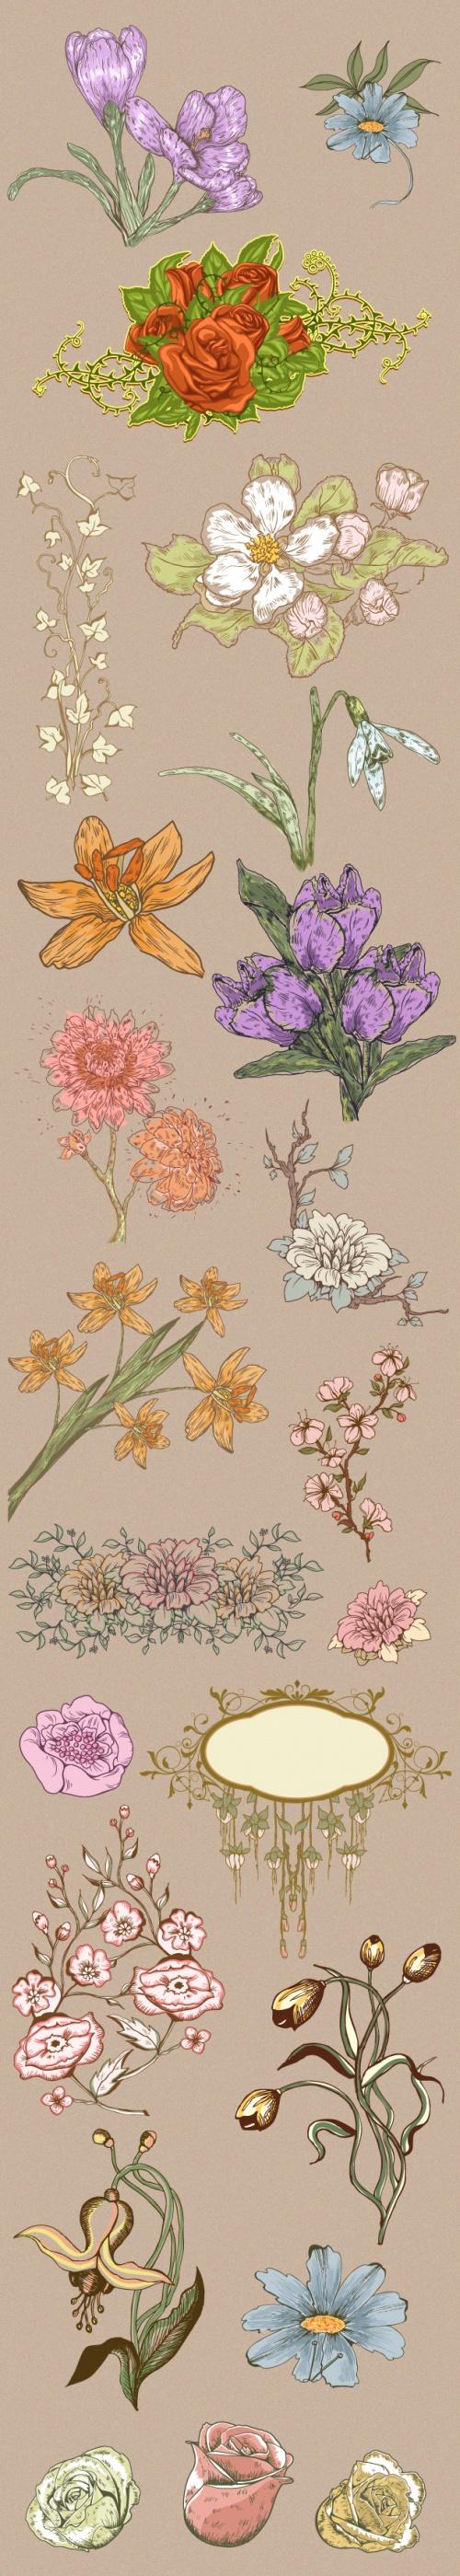 Designtnt - Floral Ornaments Set 3